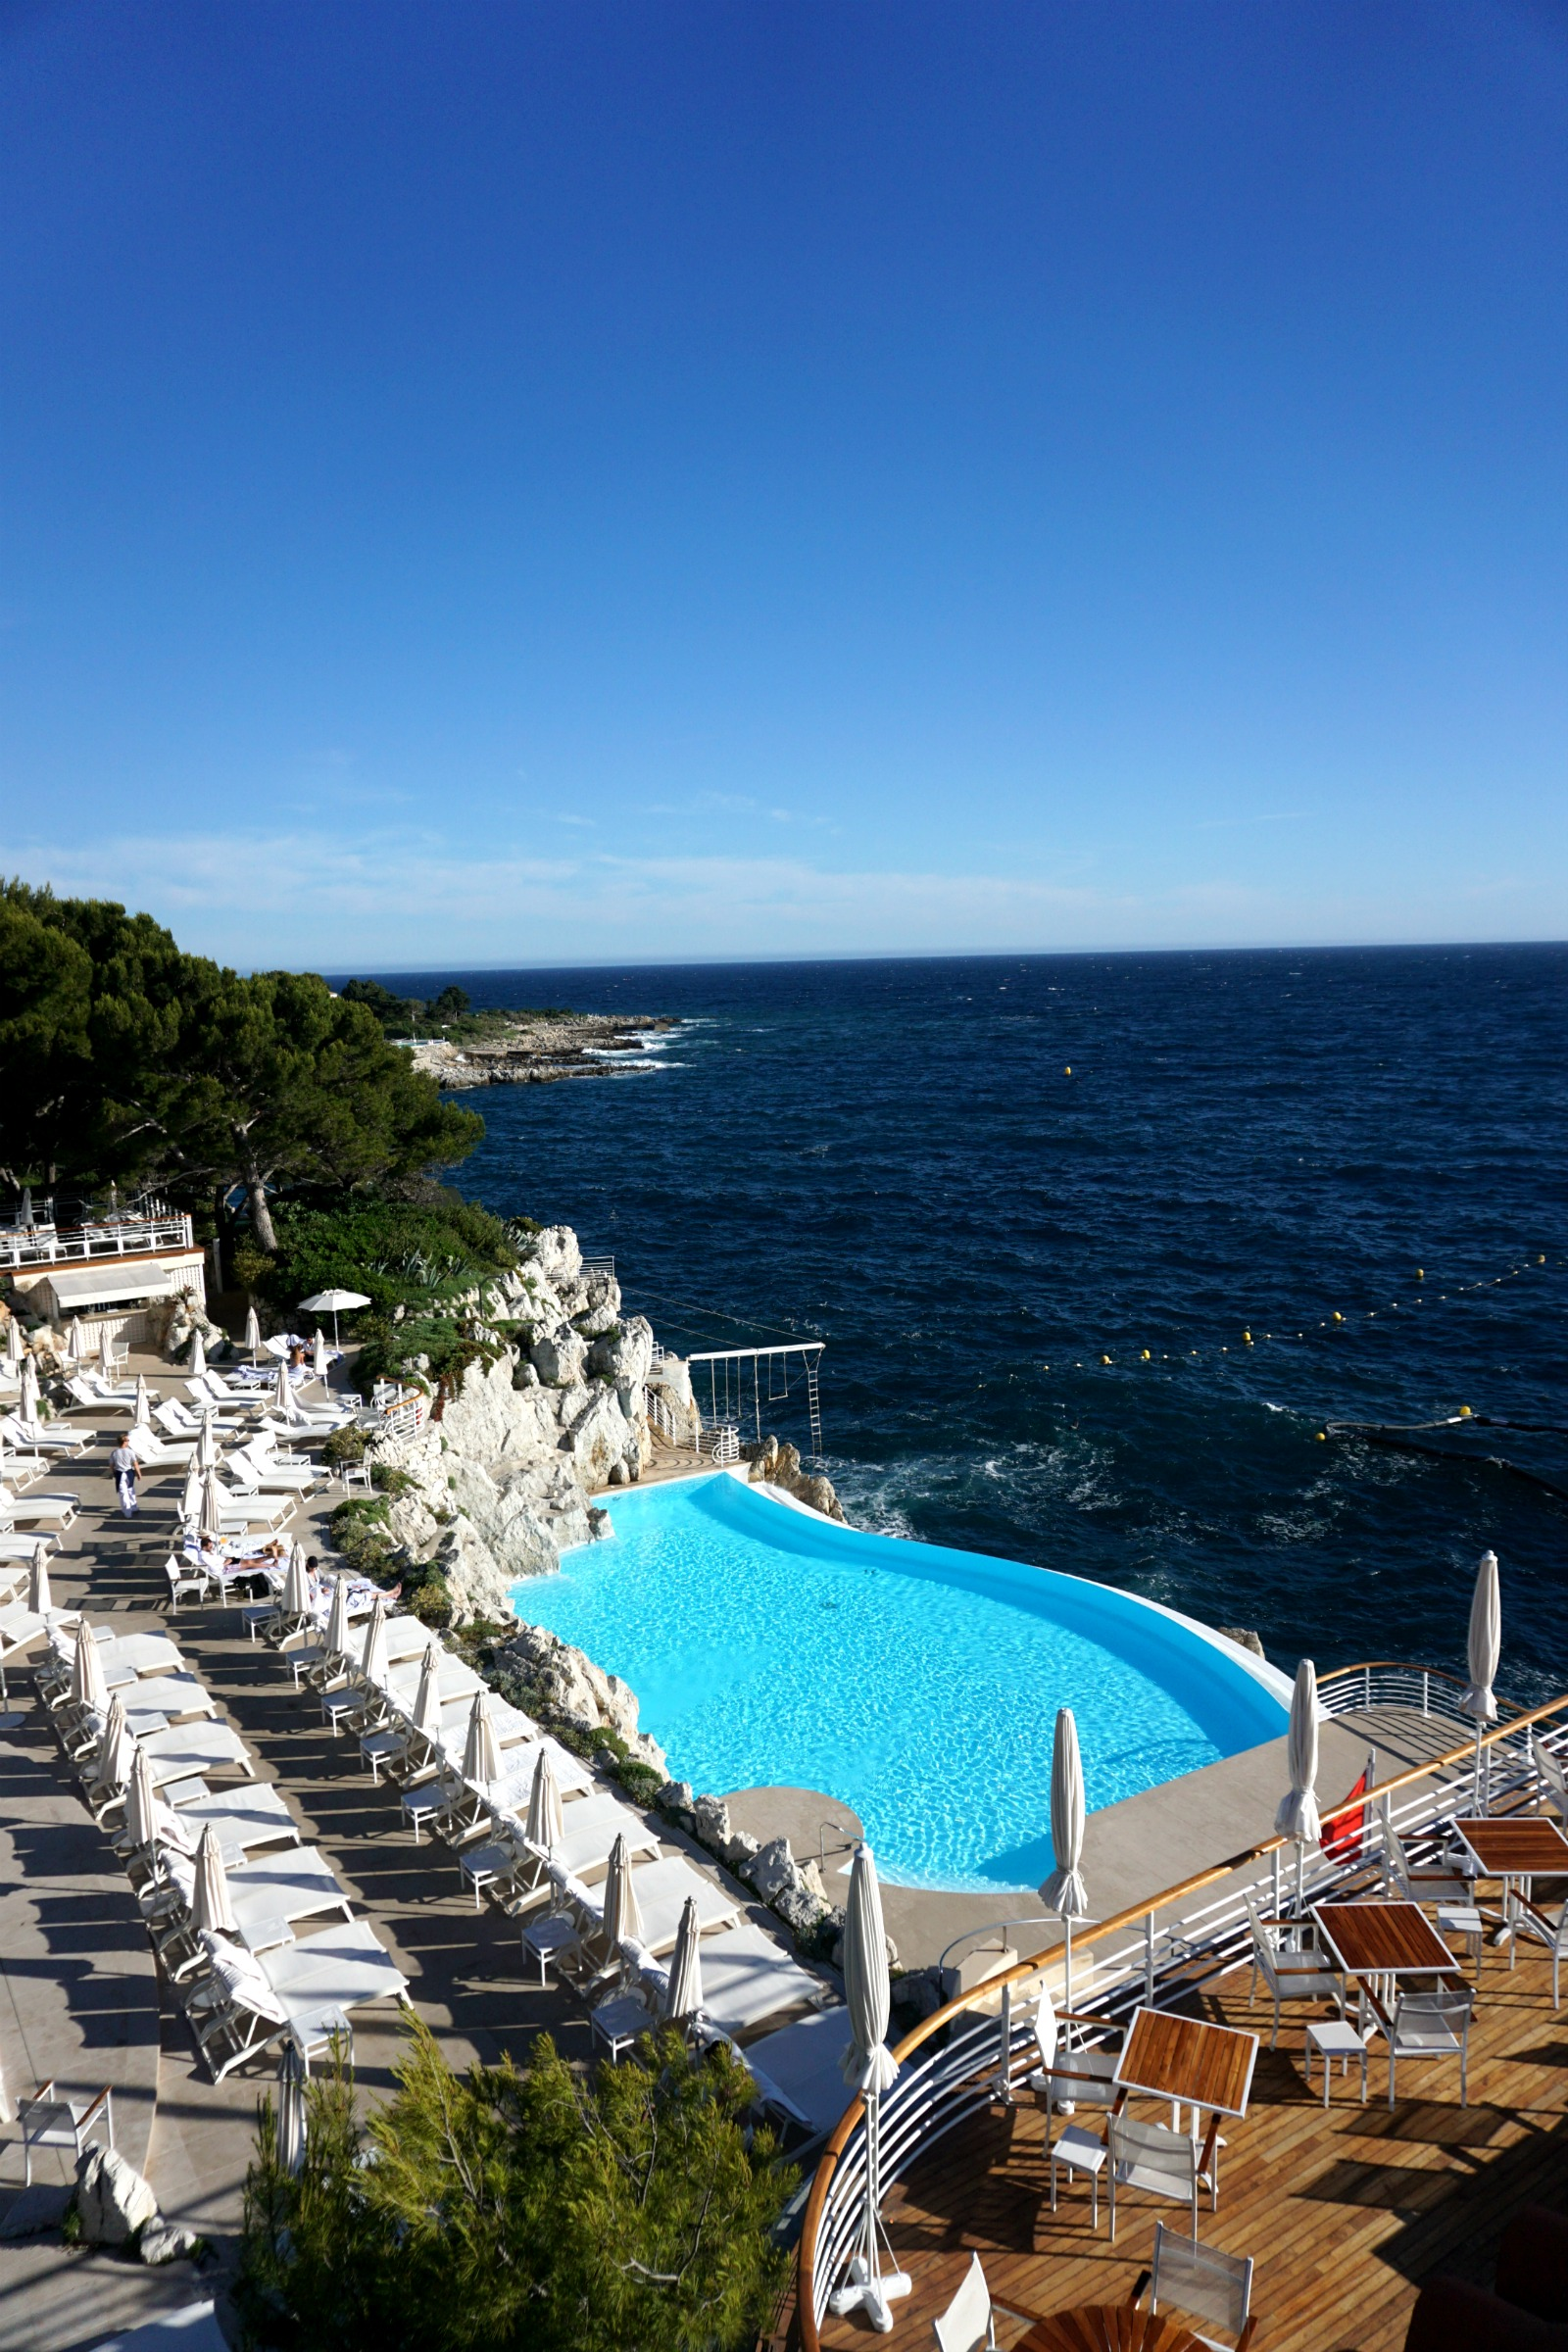 Hotel Du Cap Eden Roc : hotel, Saint, Ferrat, Hotel, Cap-Eden-Roc, Antibes,, France, Whimsy